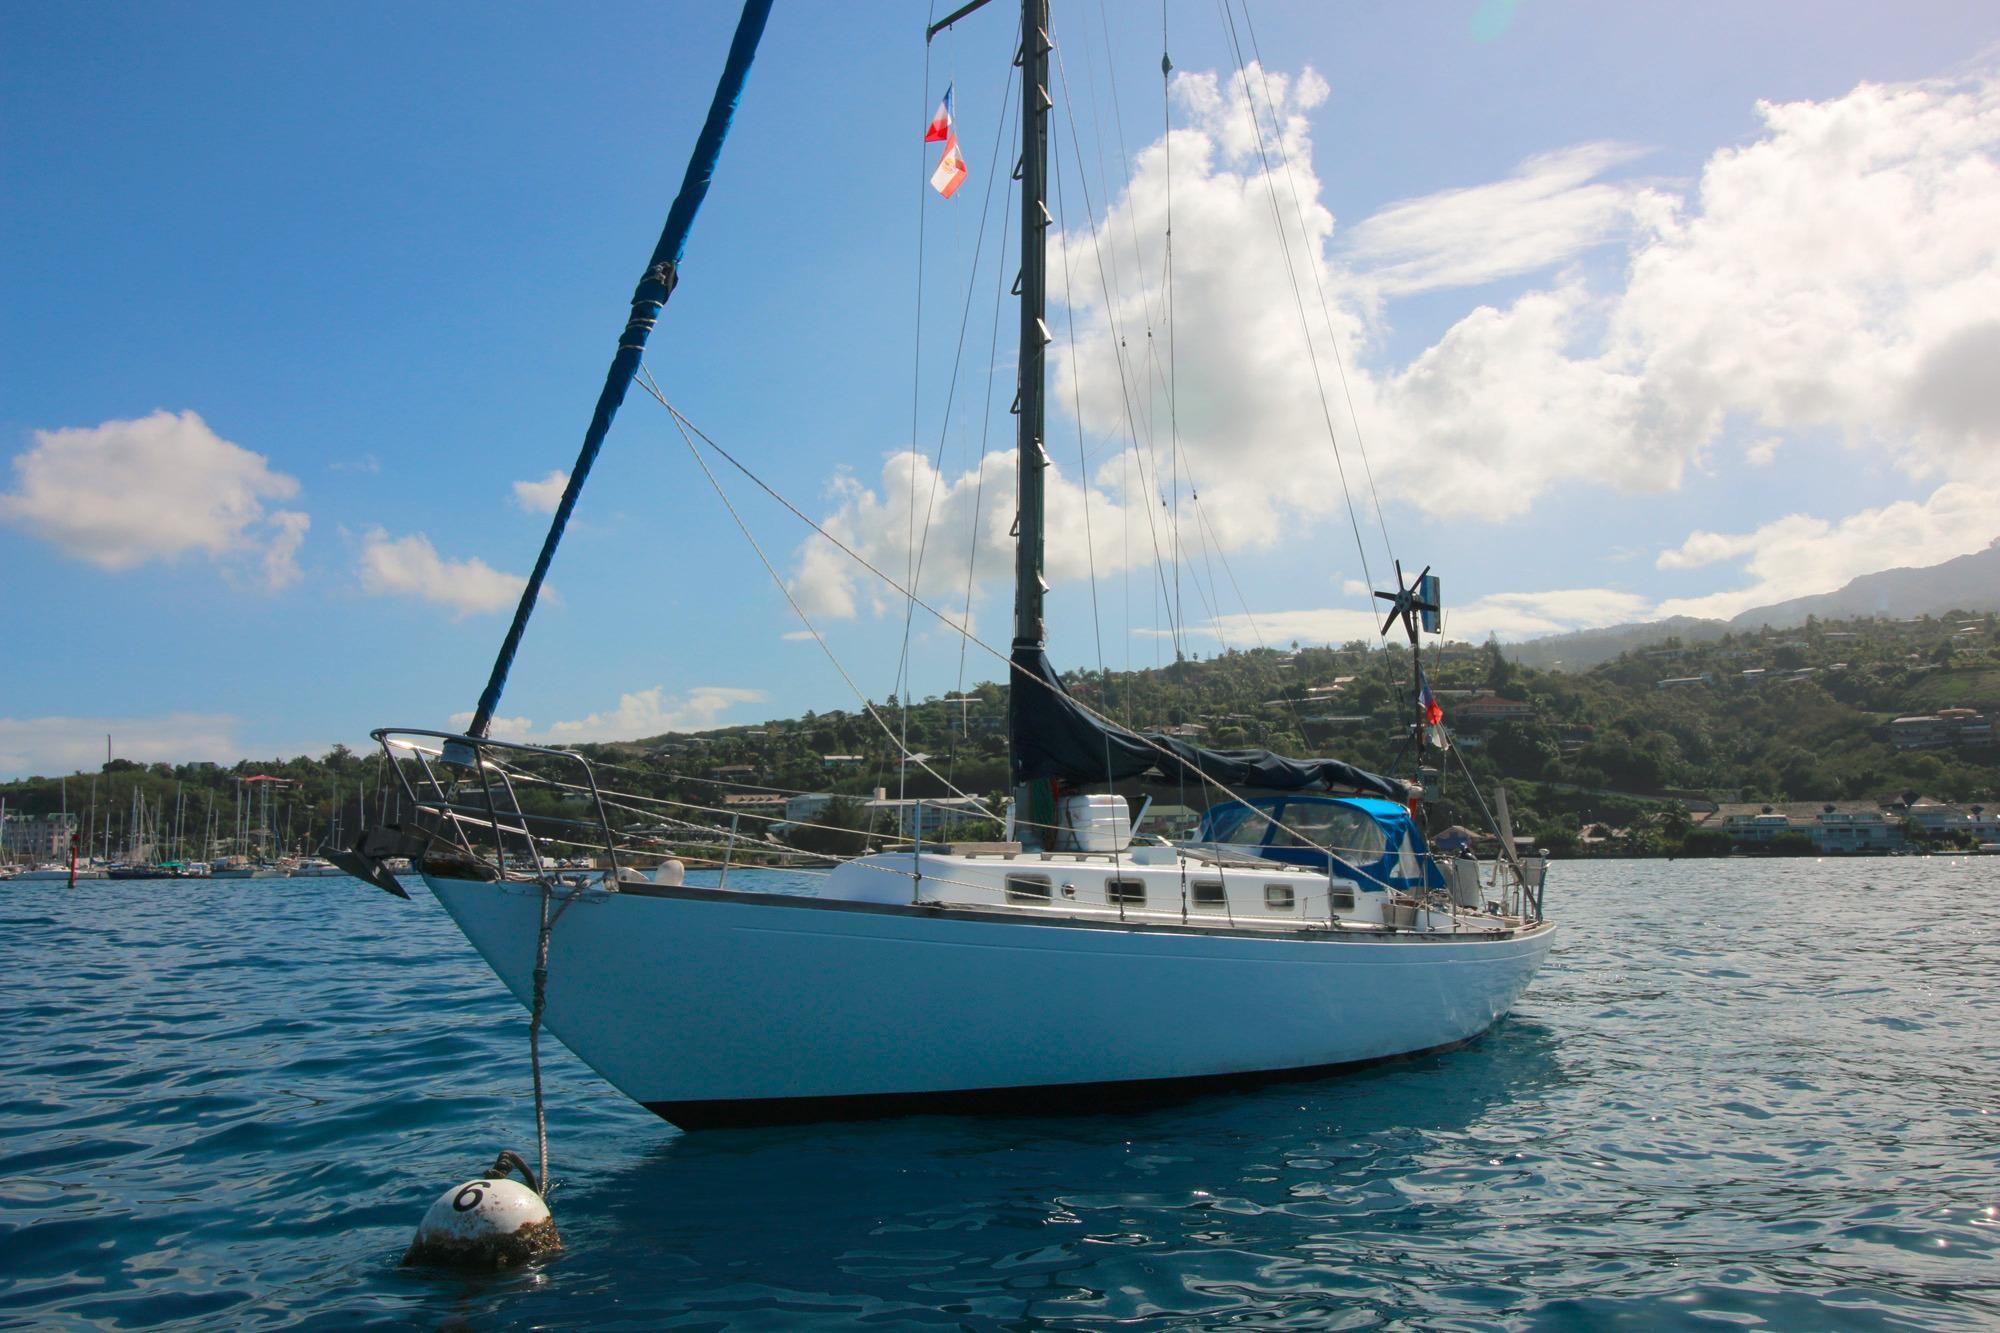 1971 alberg alberg 37 sail boat for sale for Arred alberg